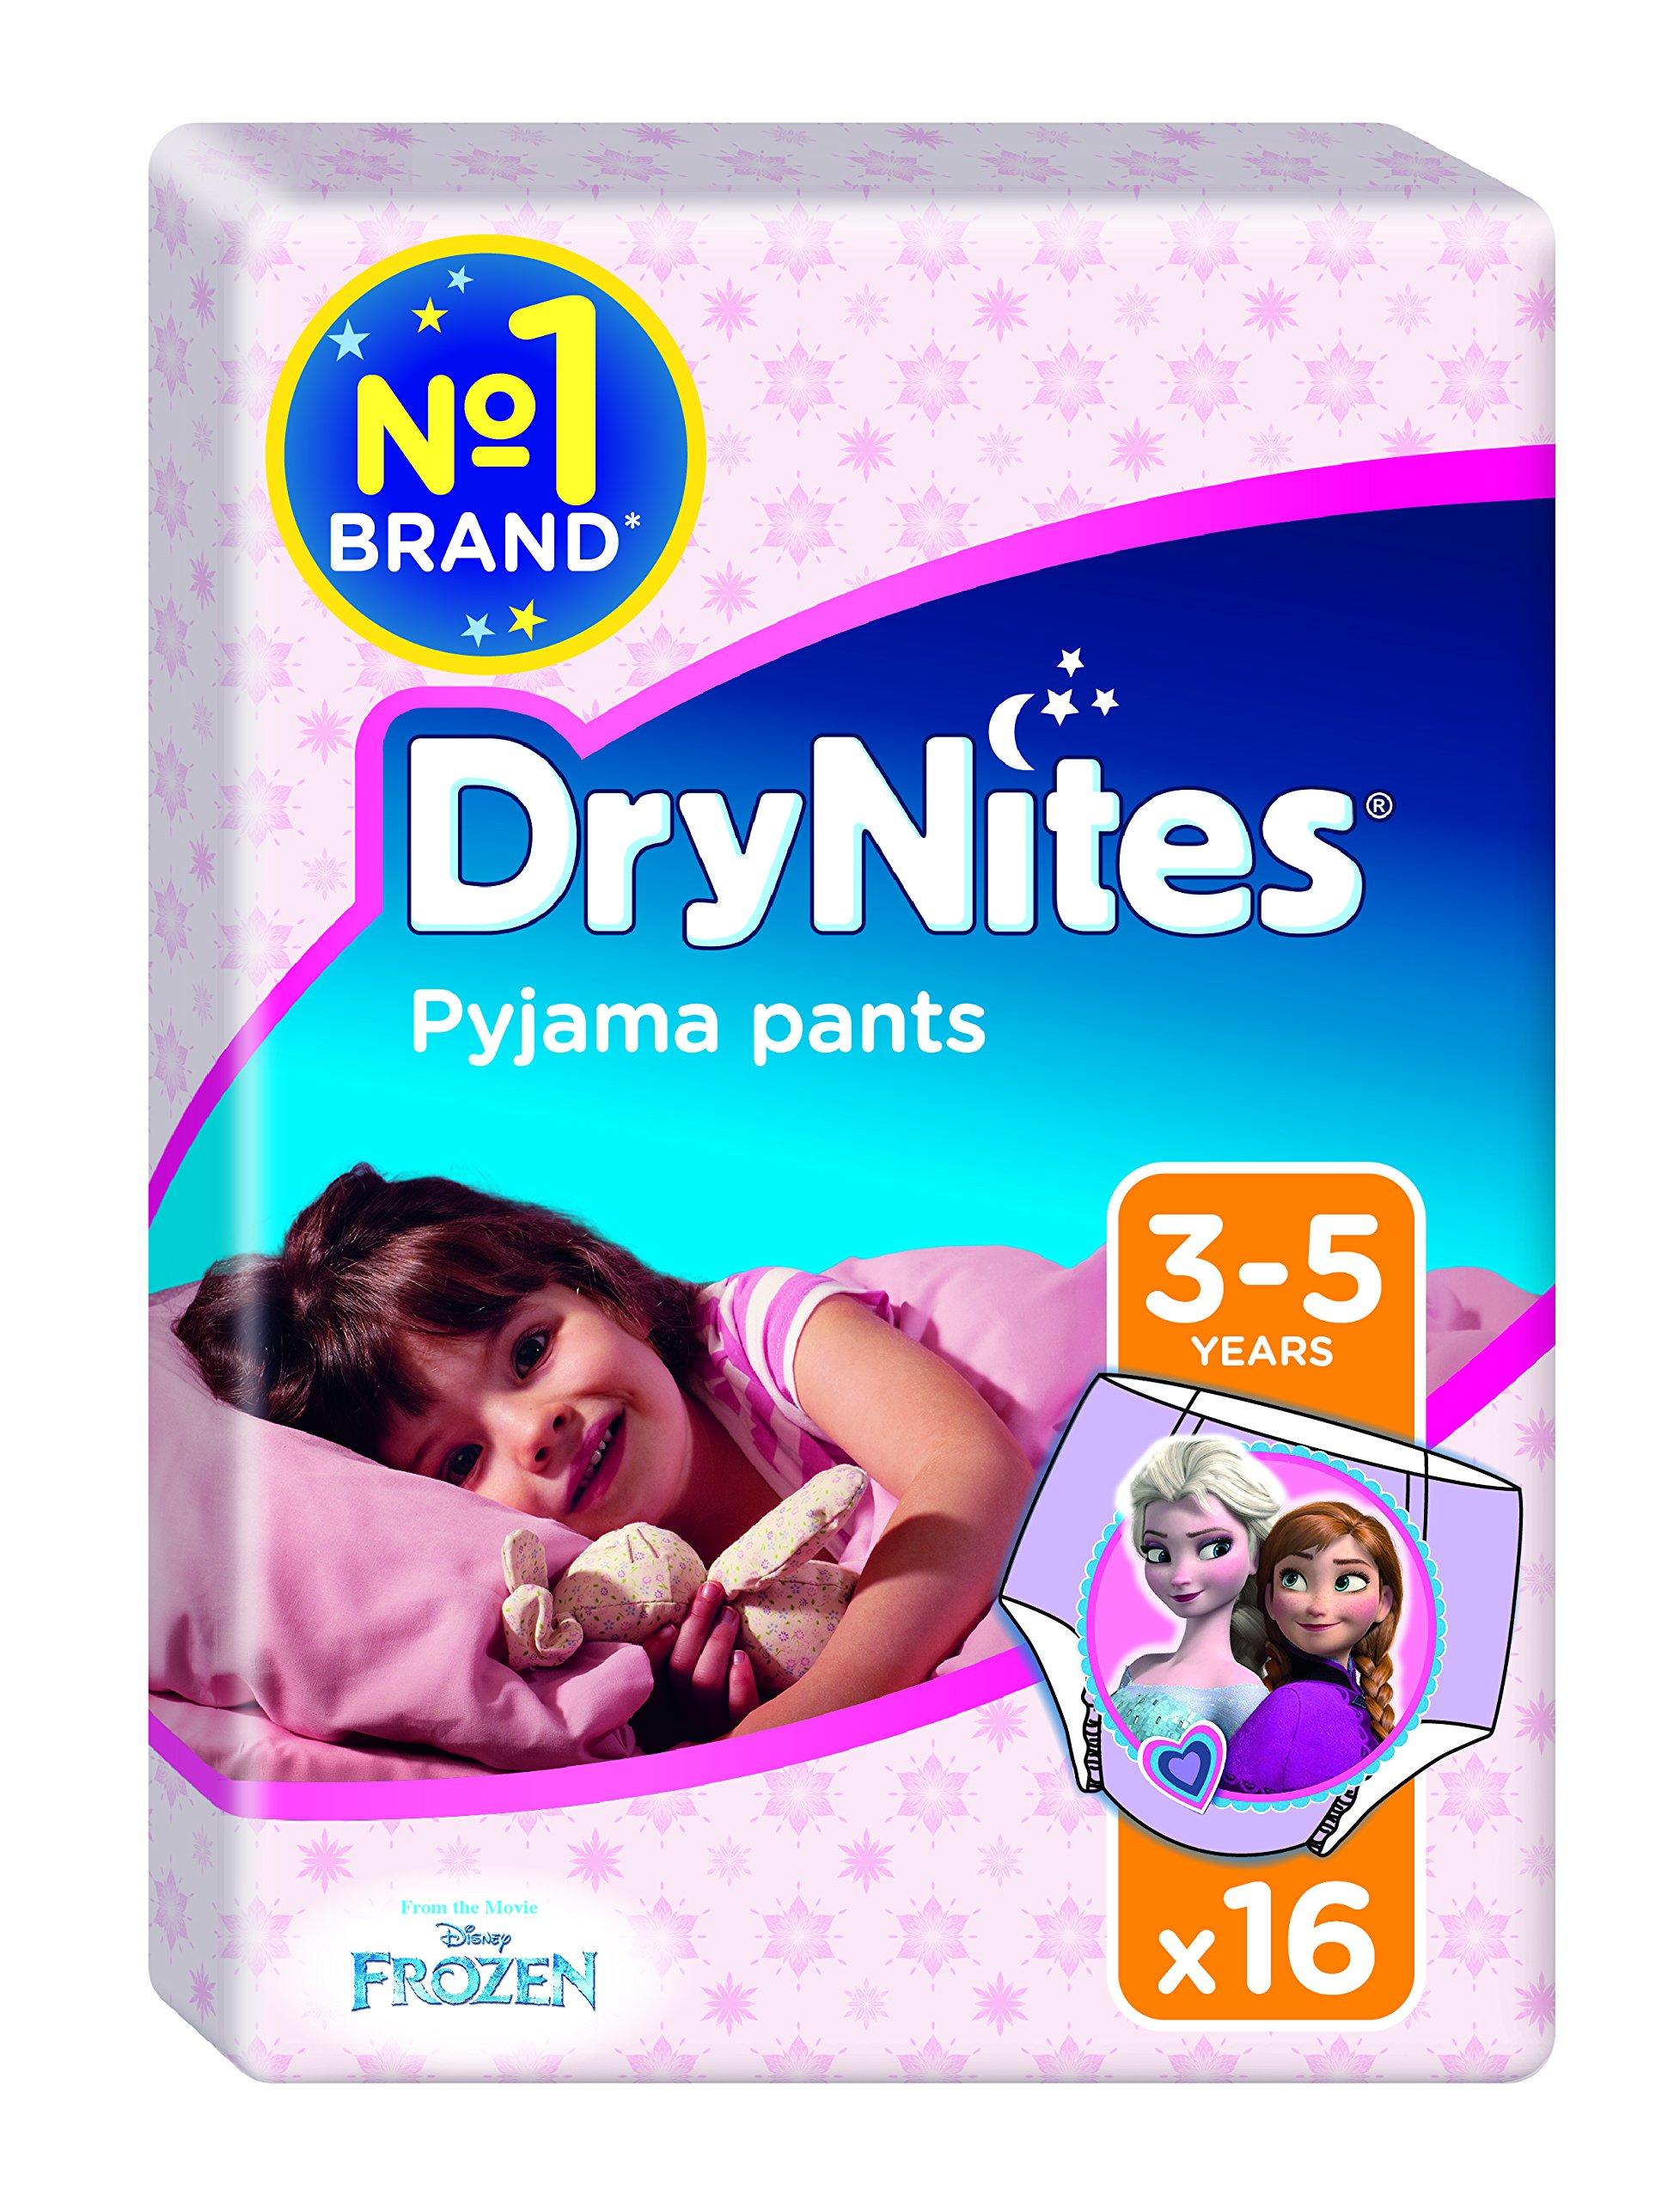 Drynites - Braguitas absorbentes, 3-5, niña, 16 unidades product image